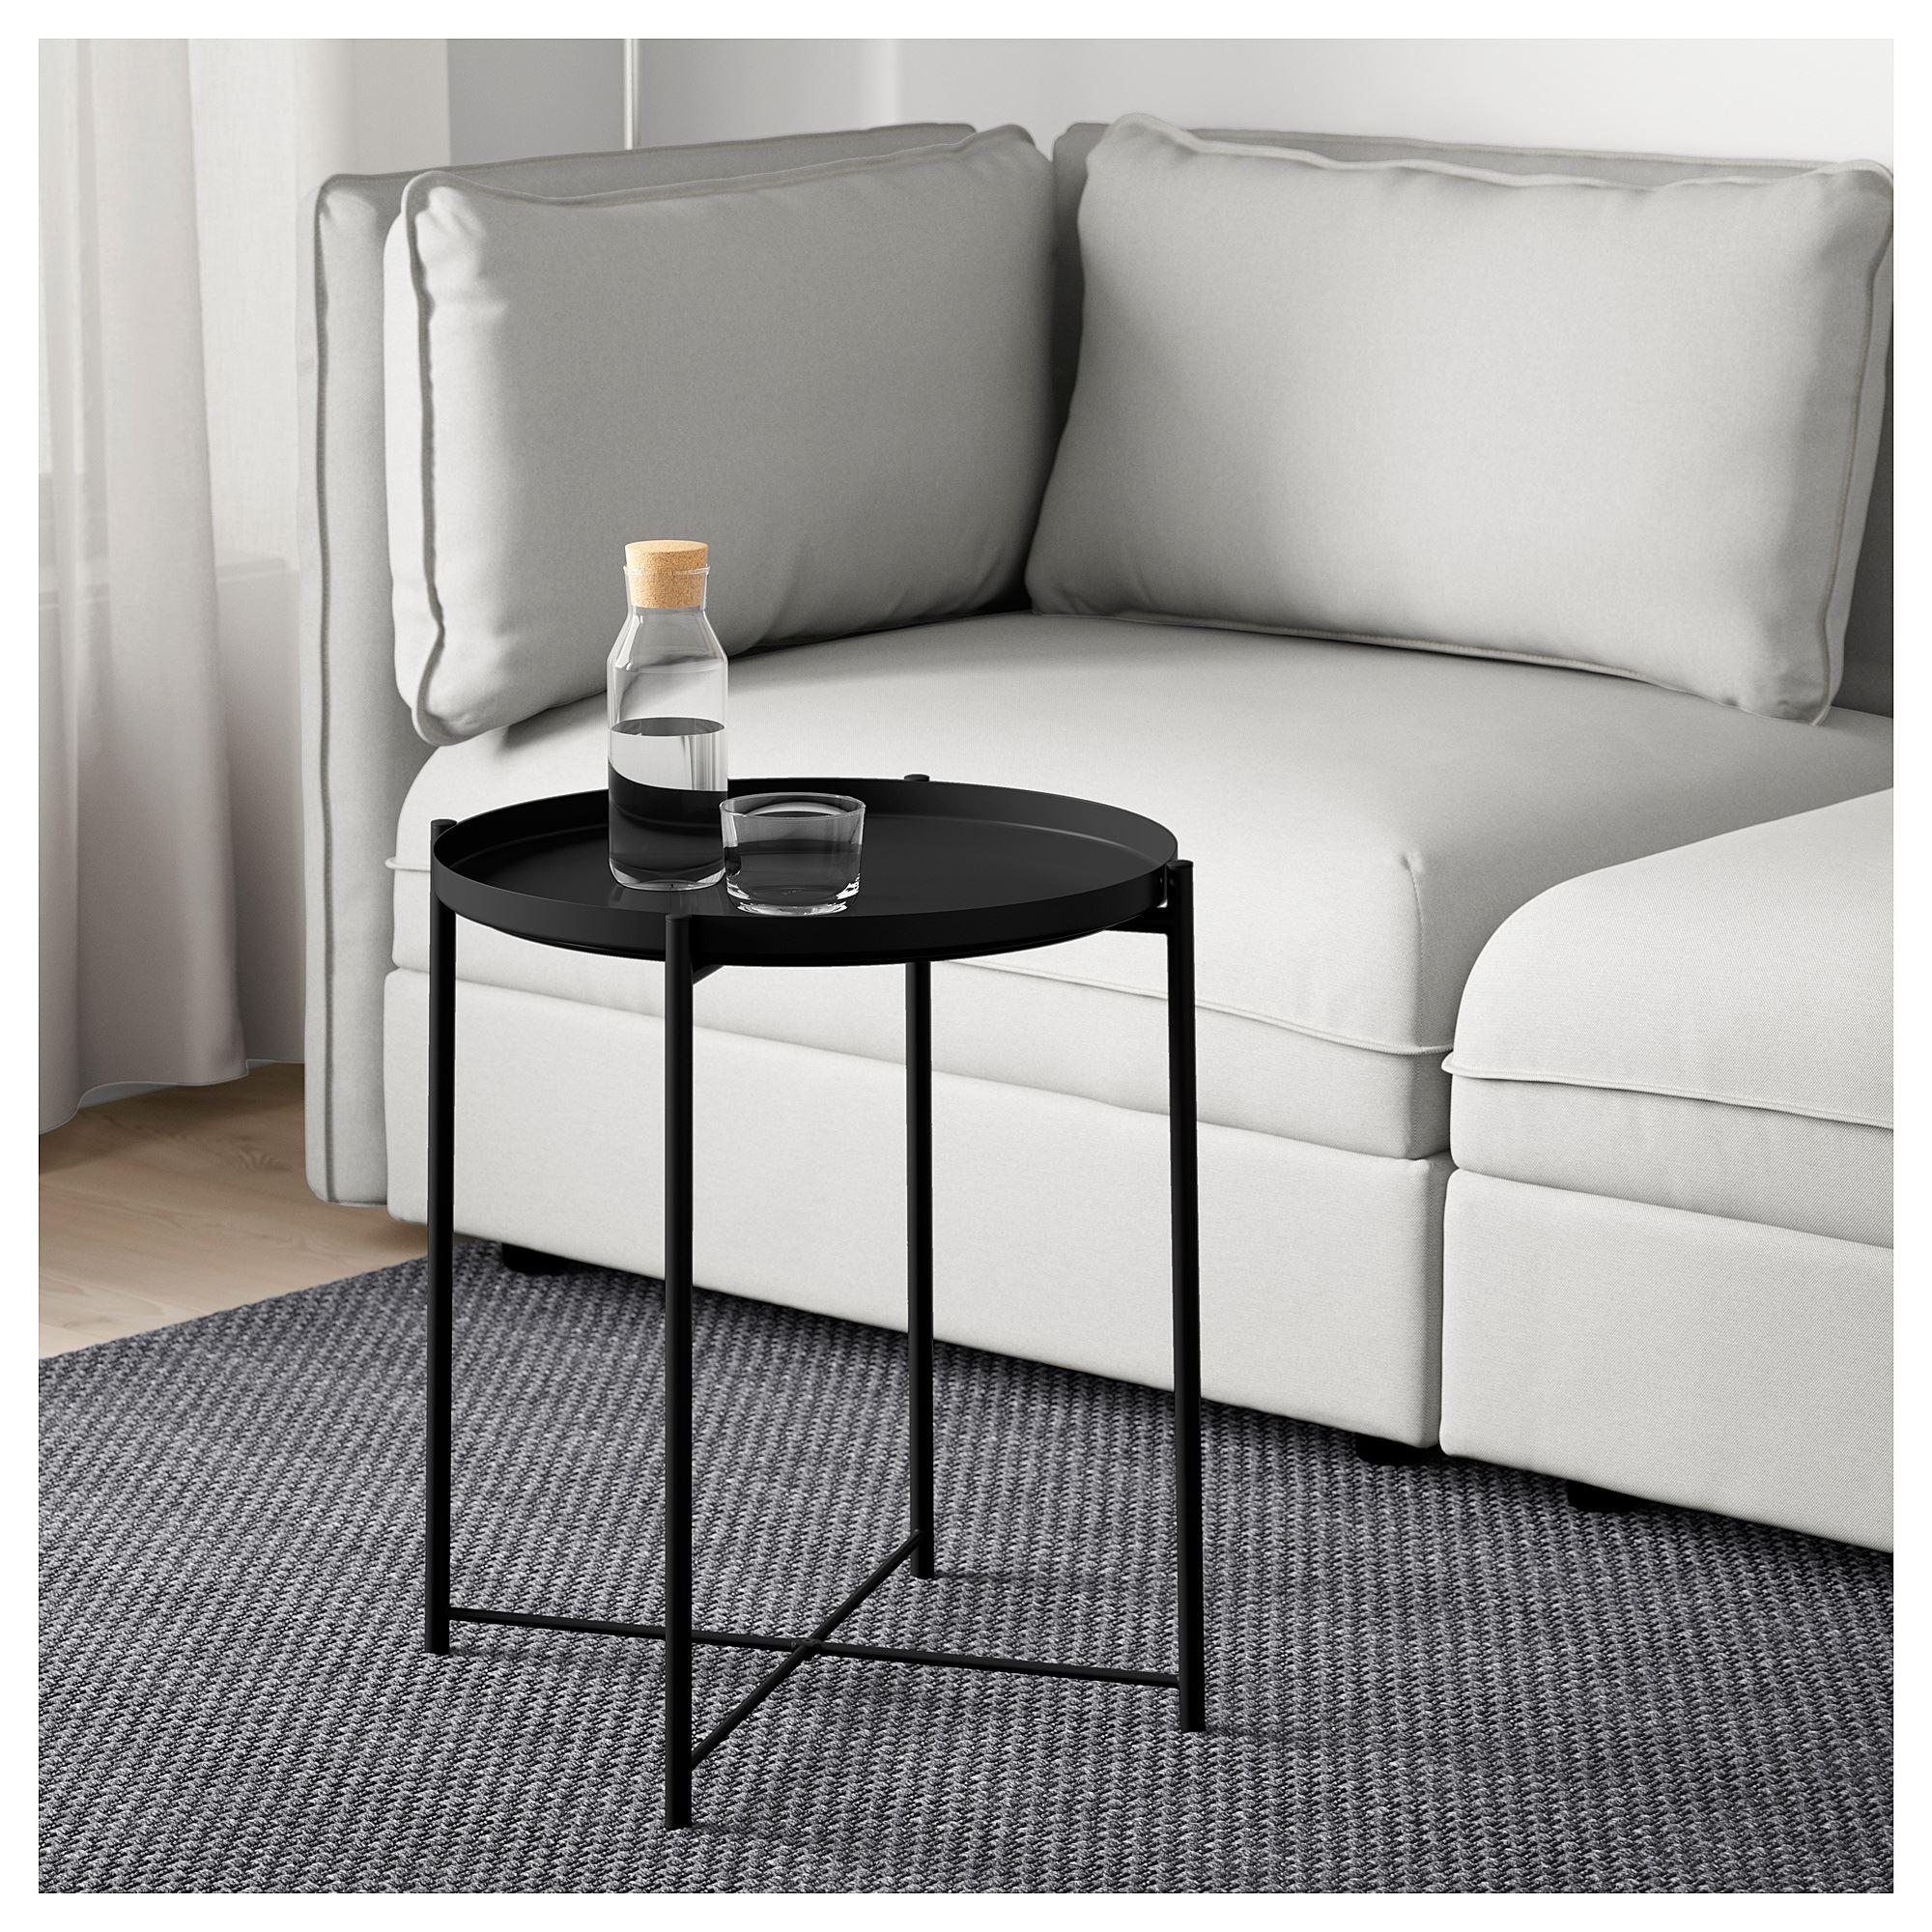 Gladom Tepsili Sehpa Siyah 45x53 Cm Ikea Oturma Odalari